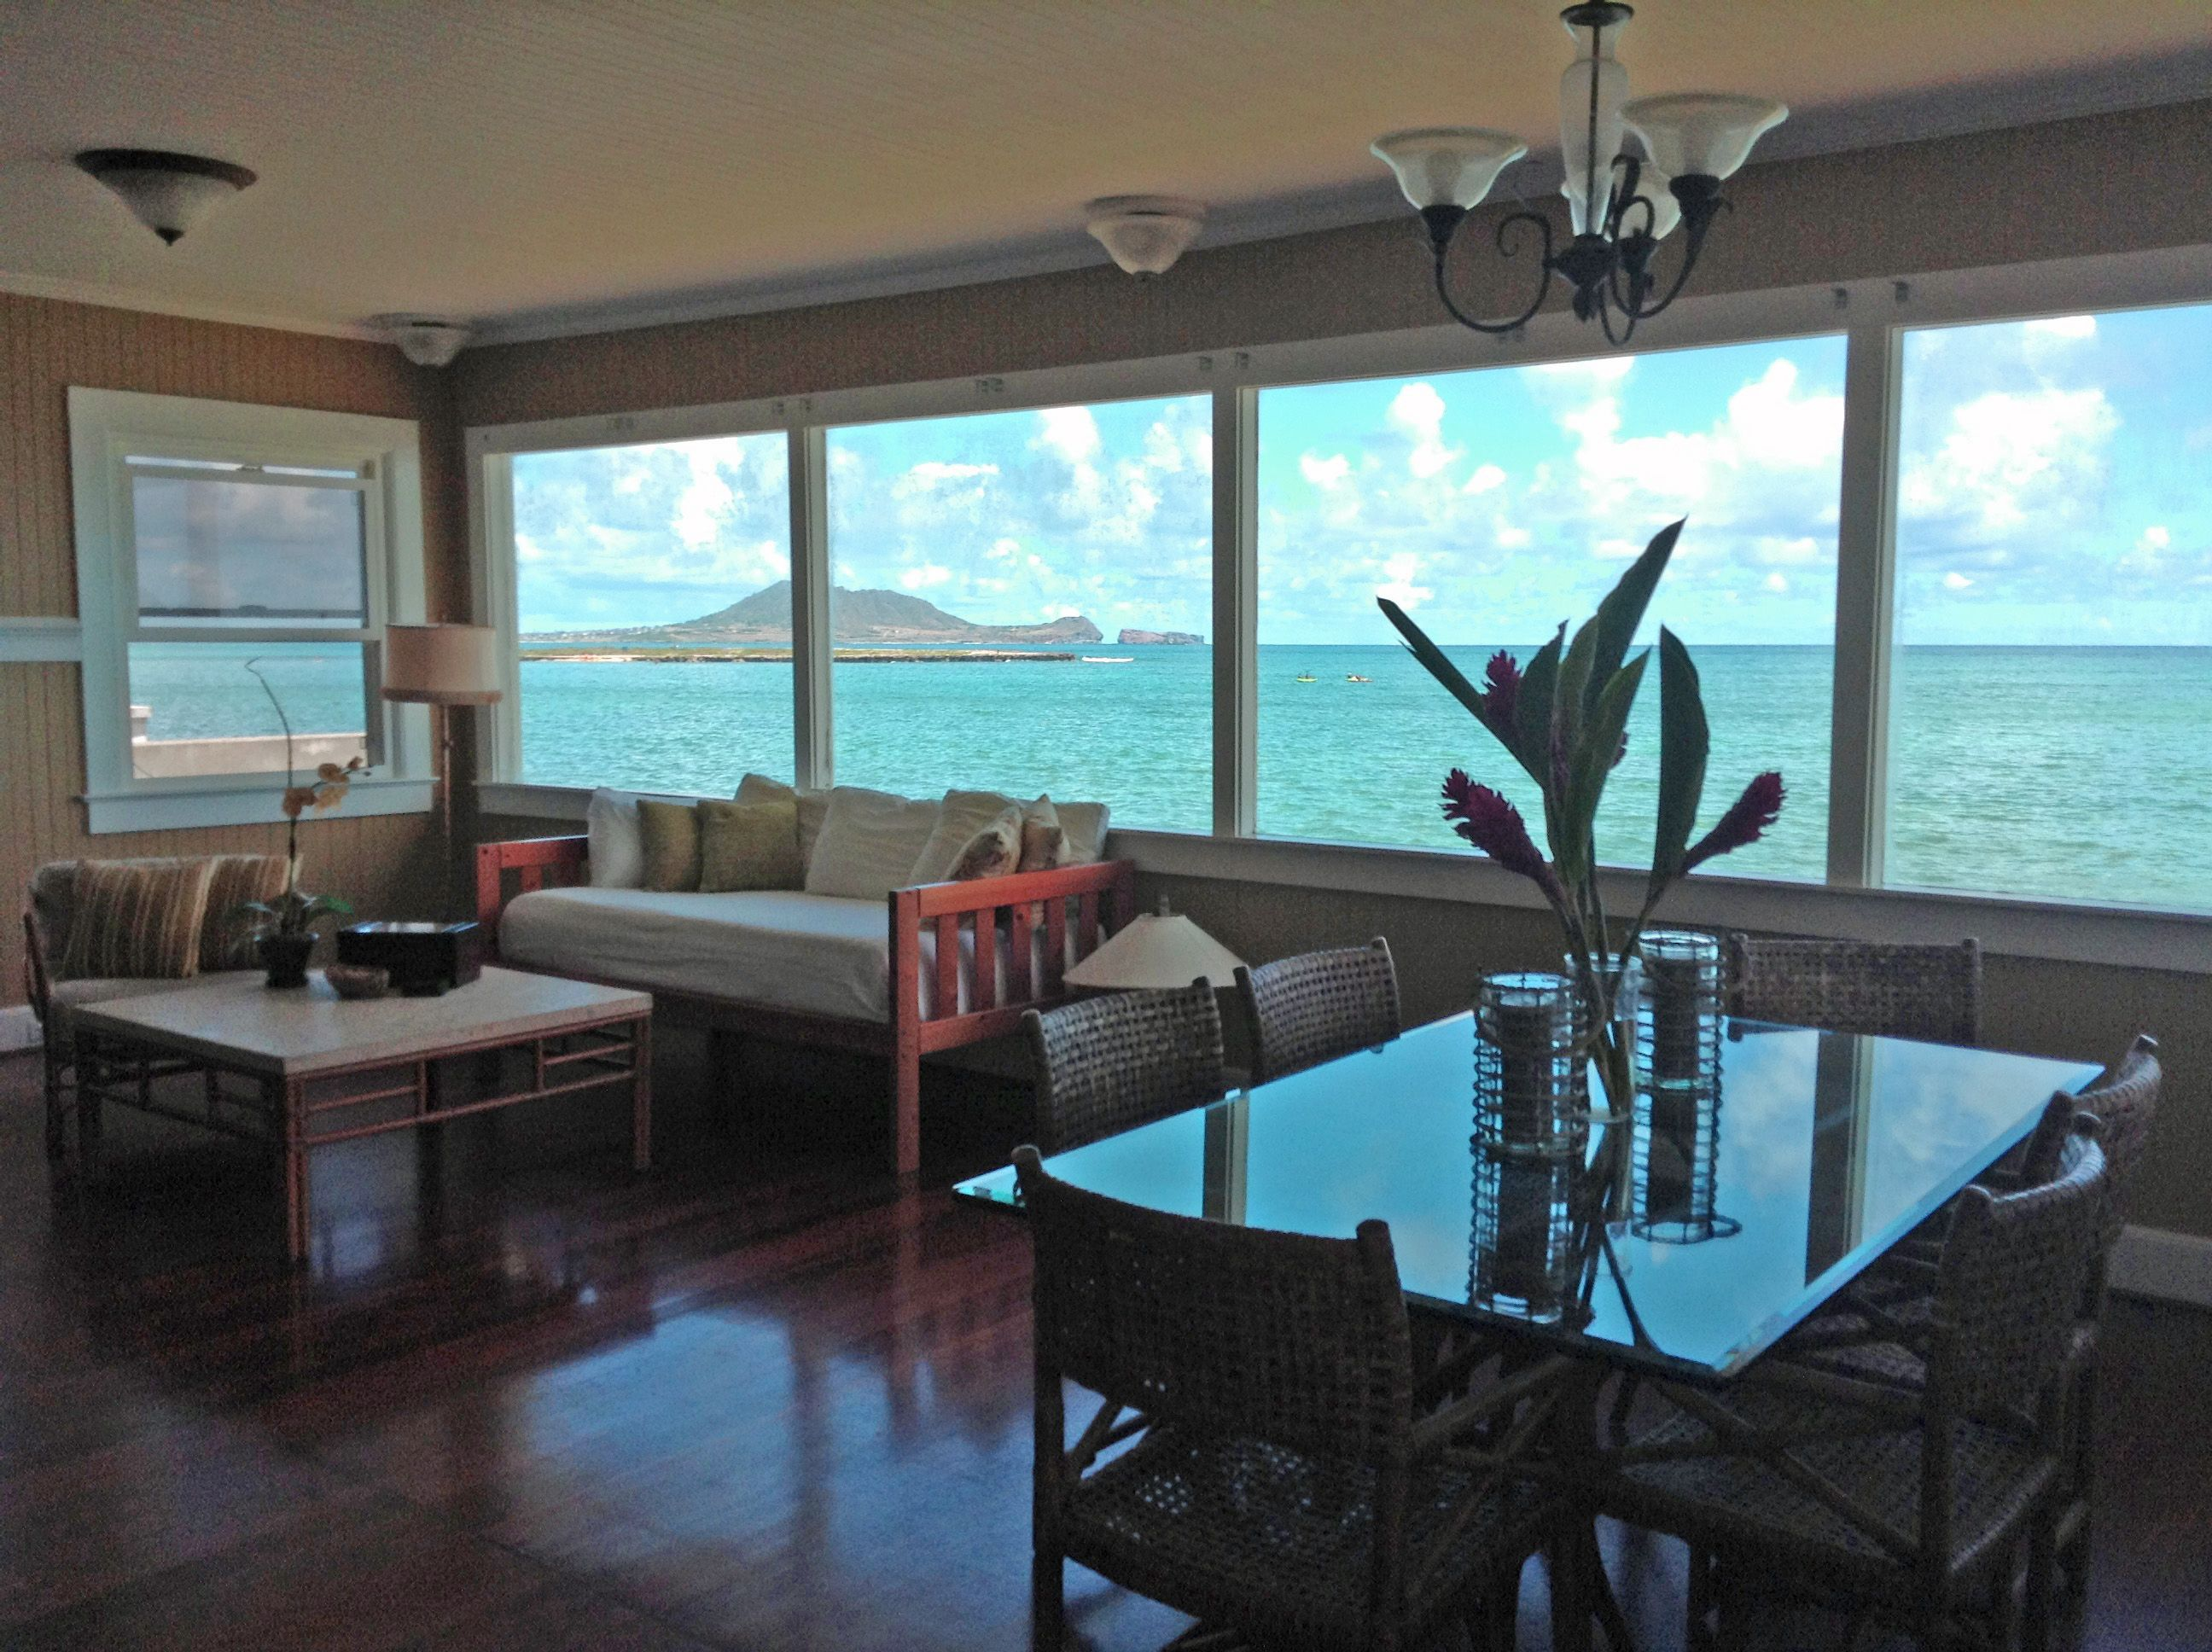 Oahu beach chair rental hawaii beach time - Lanikai Home For Rent Rare 3br 2ba Historic Oceanfront Lanikai Beach House For Rent